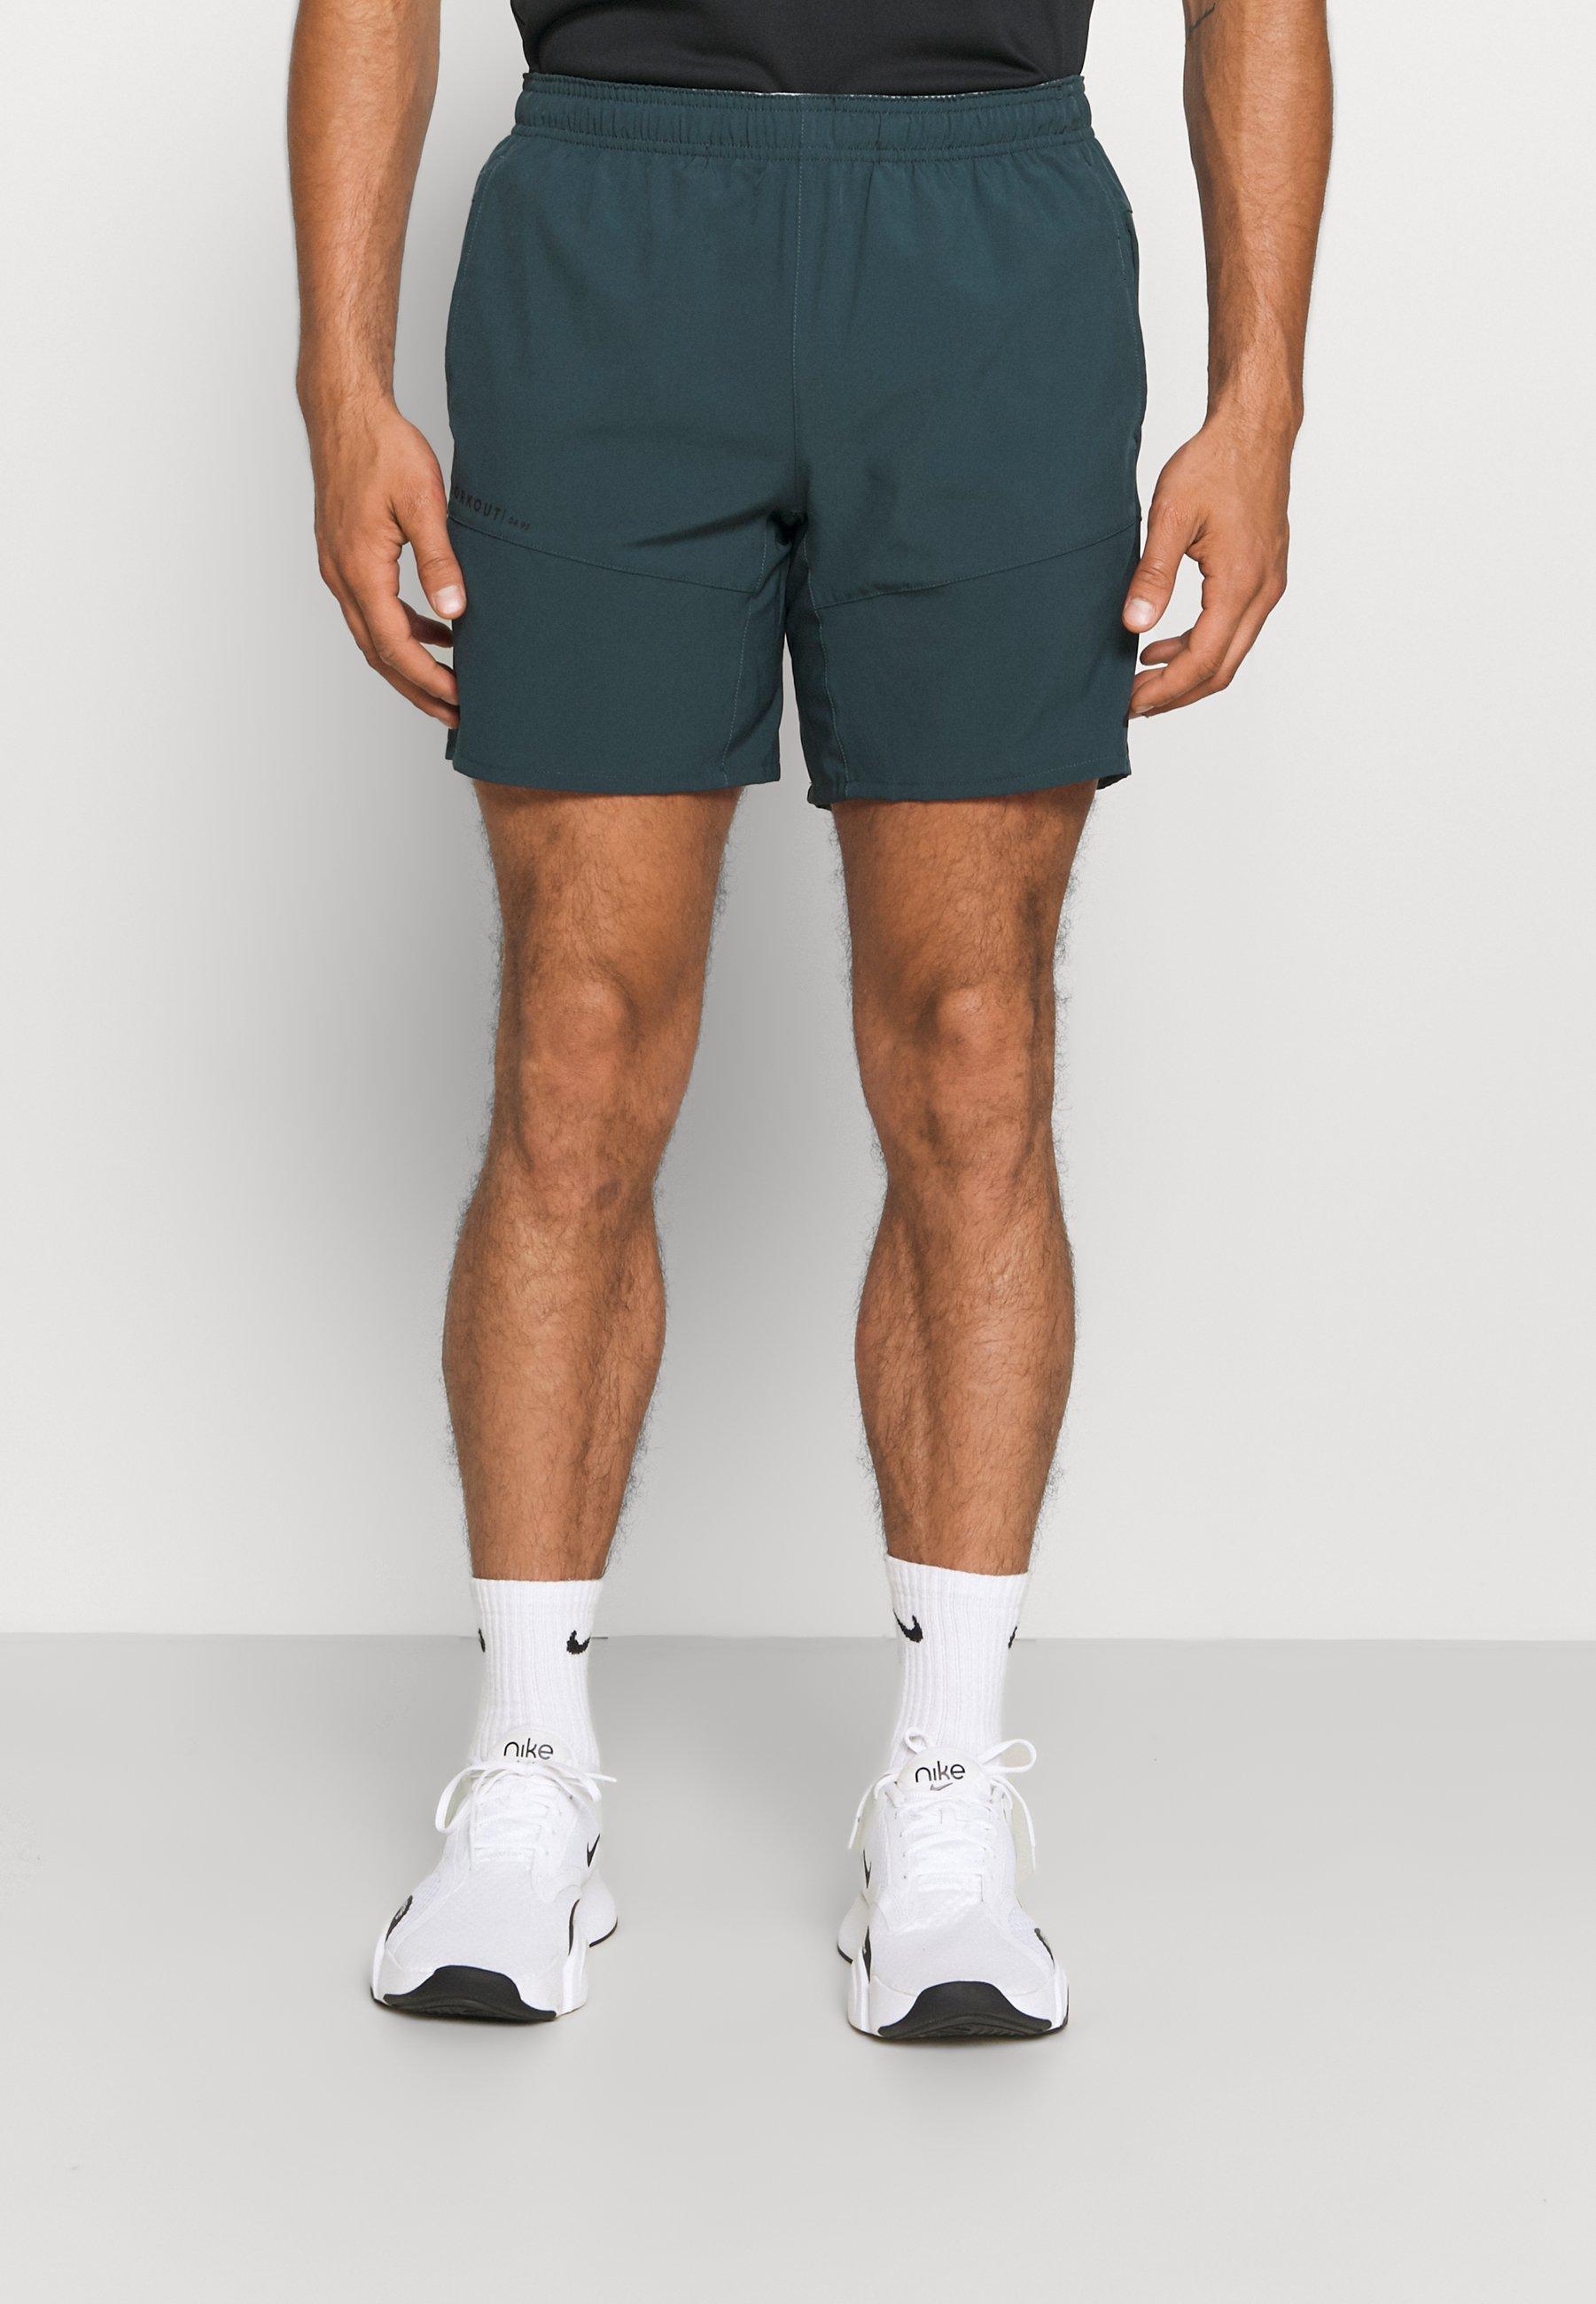 Homme Men's training shorts - Short de sport